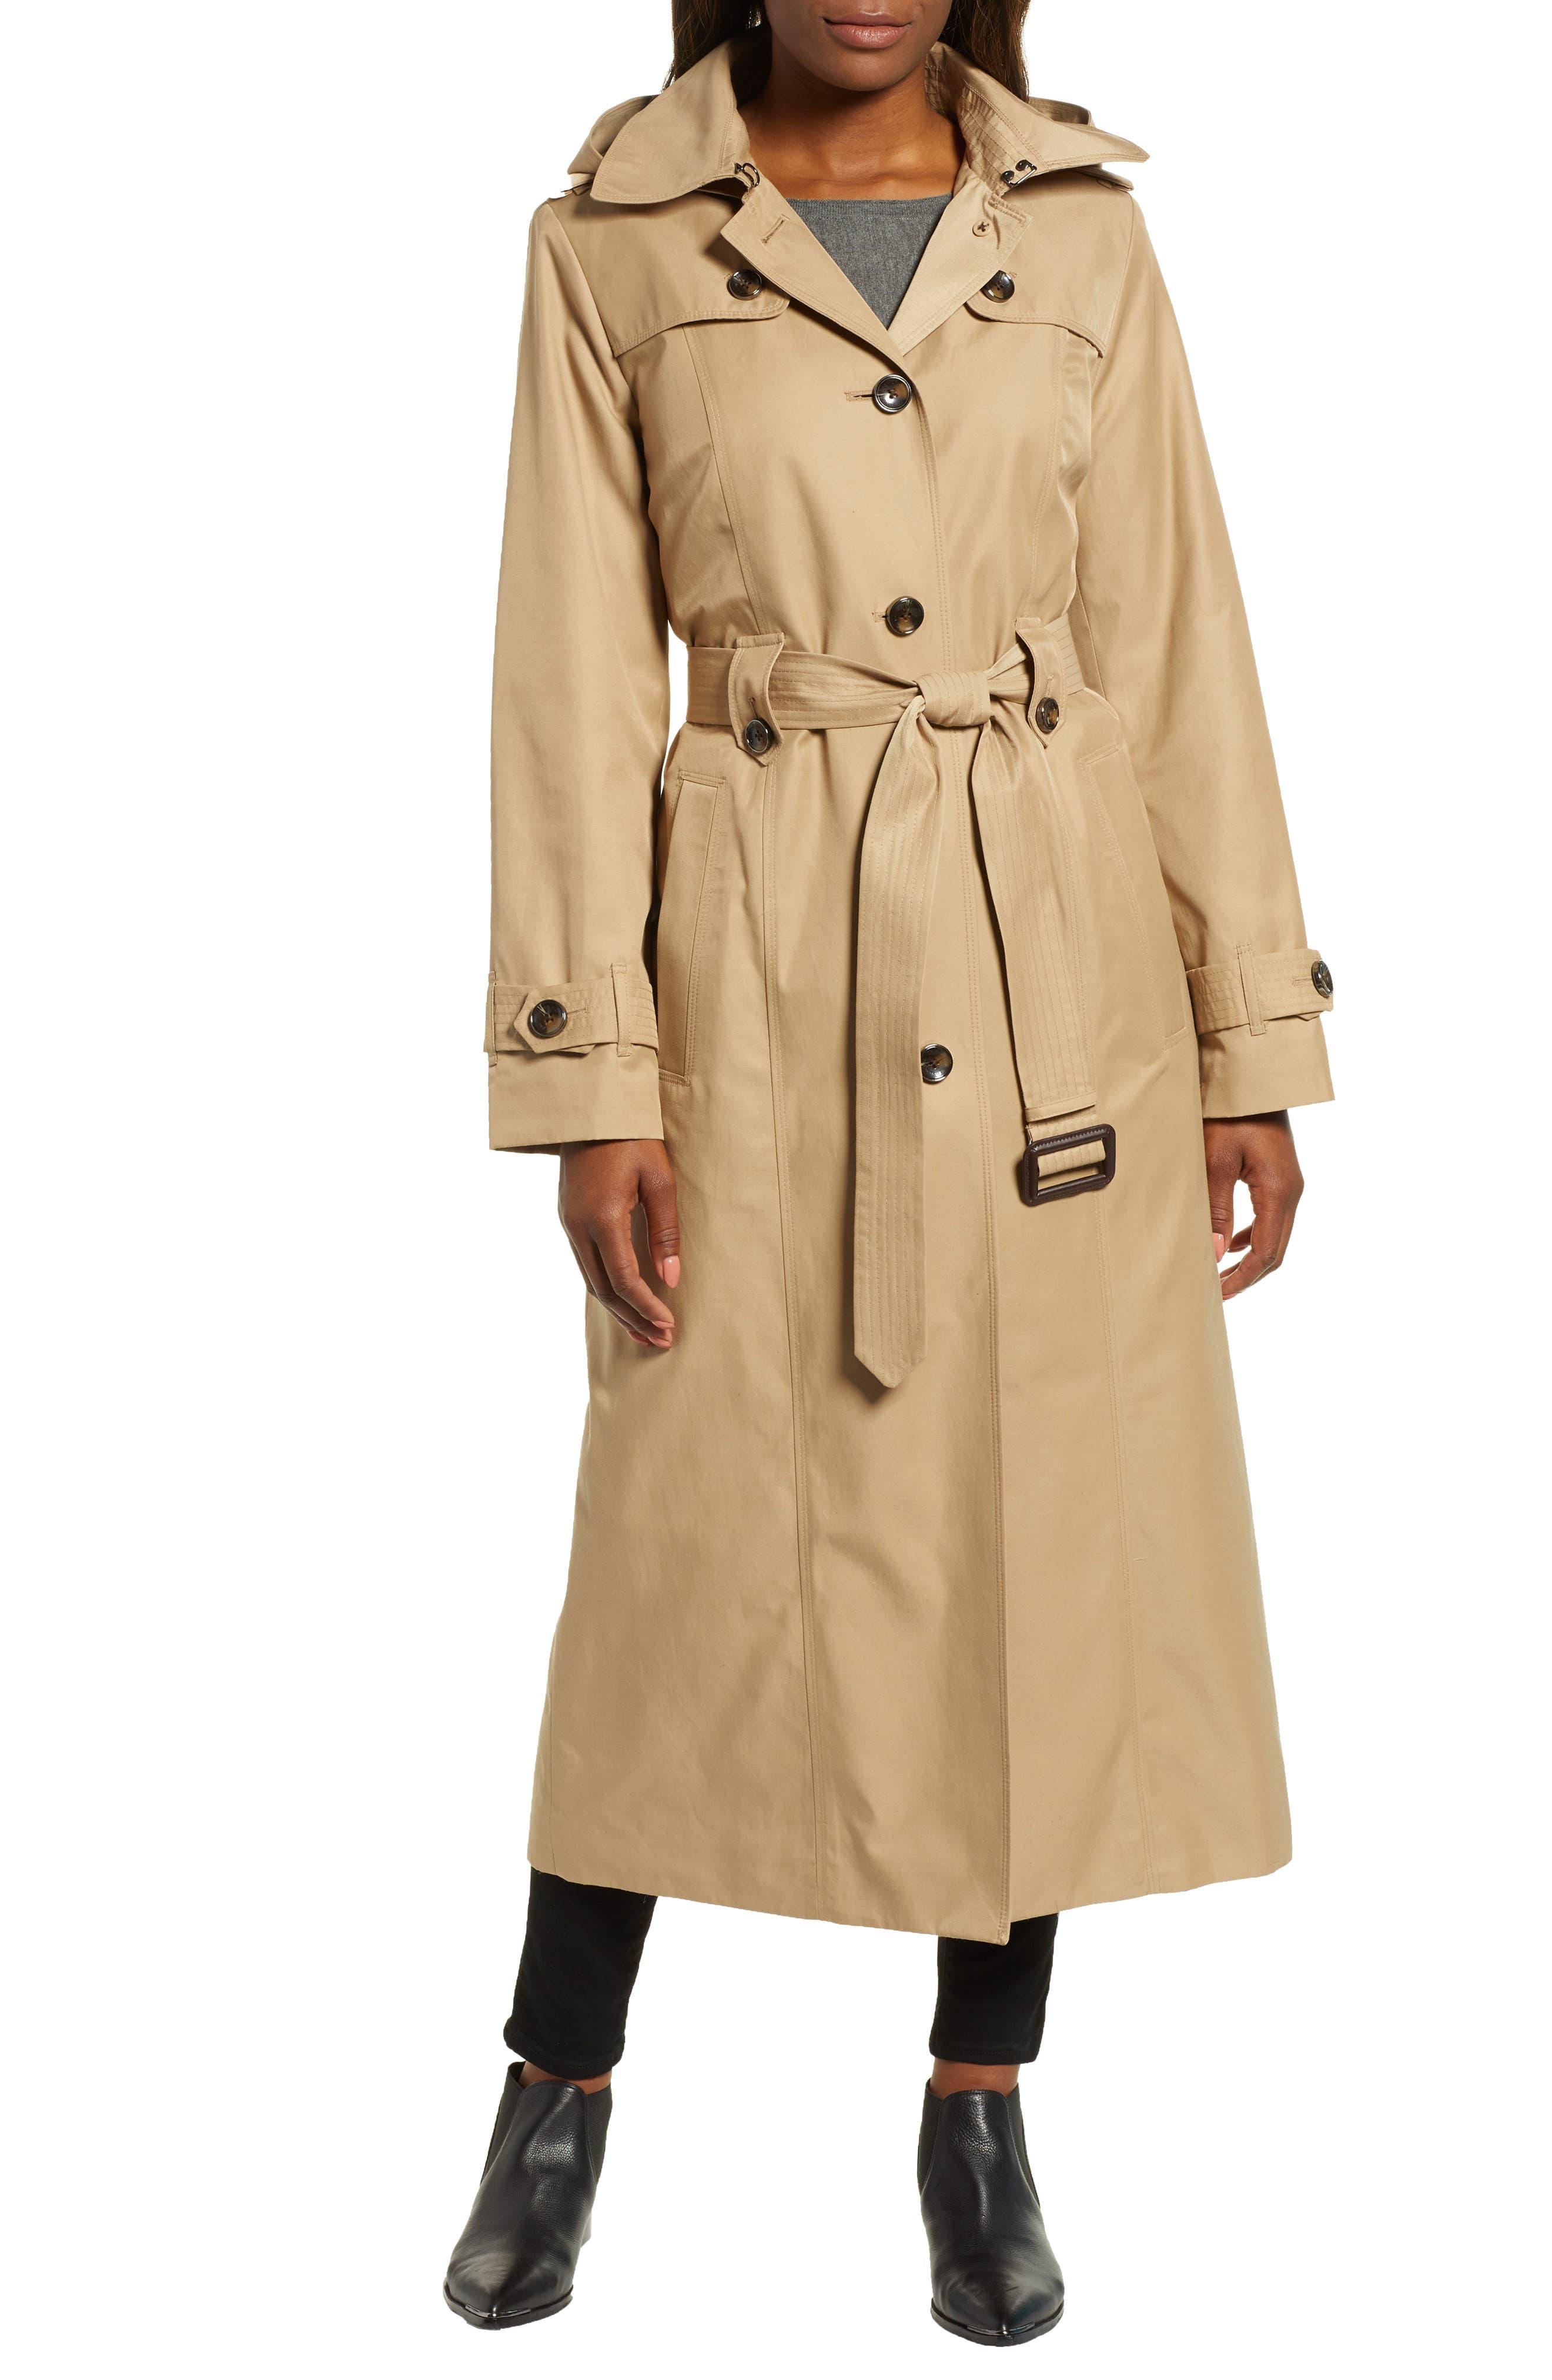 LONDON FOG, Jill Long Trench Coat, Main thumbnail 1, color, KHAKI